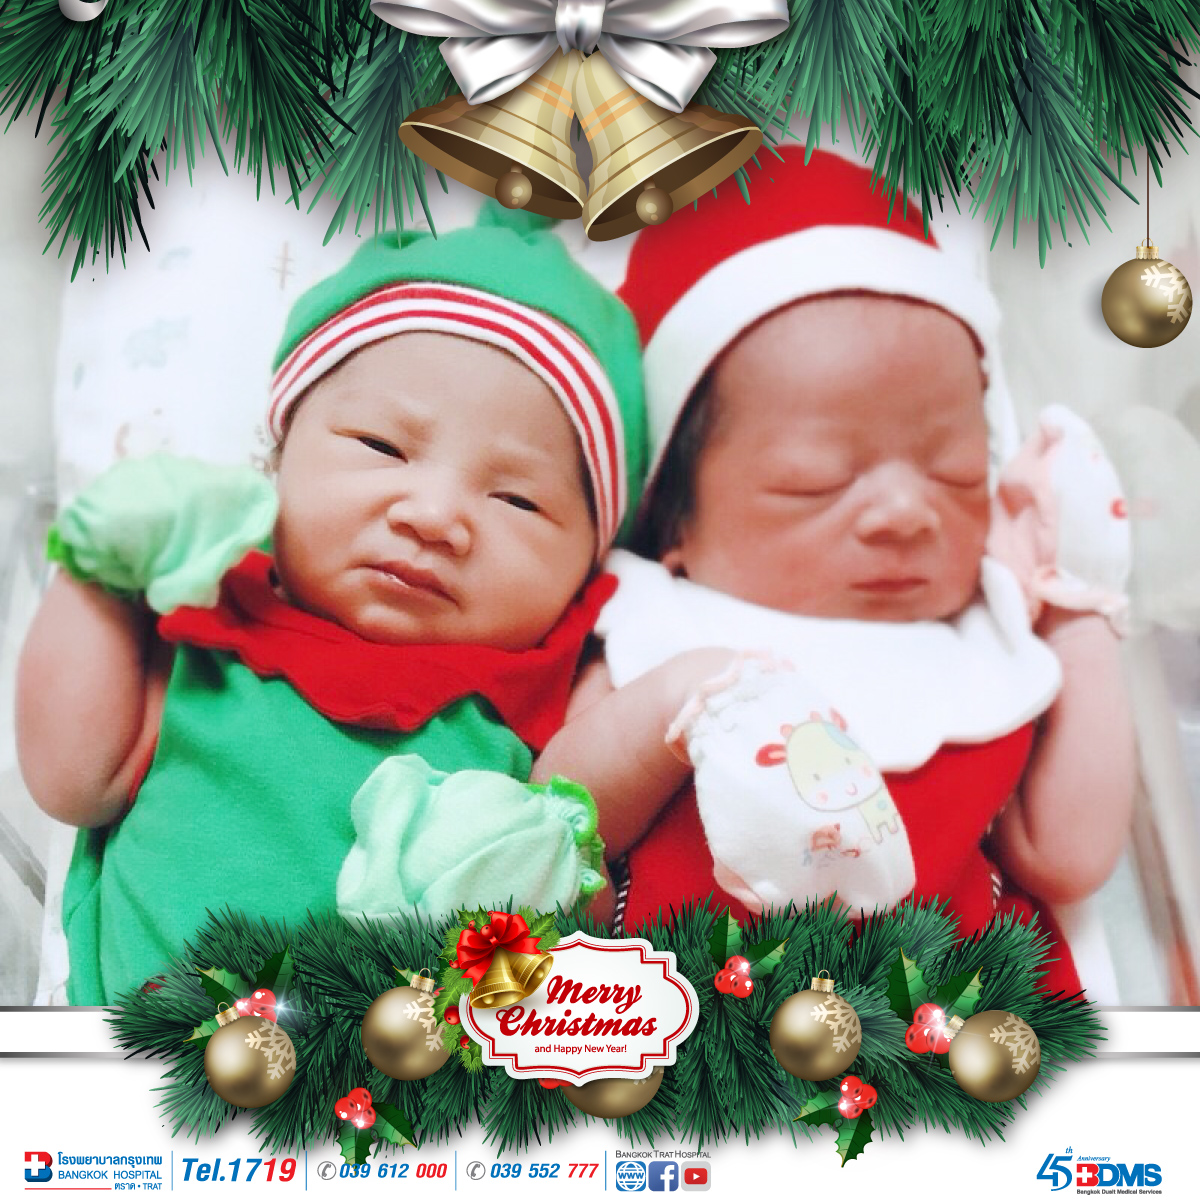 Merry Christmas & Happy new year 2018